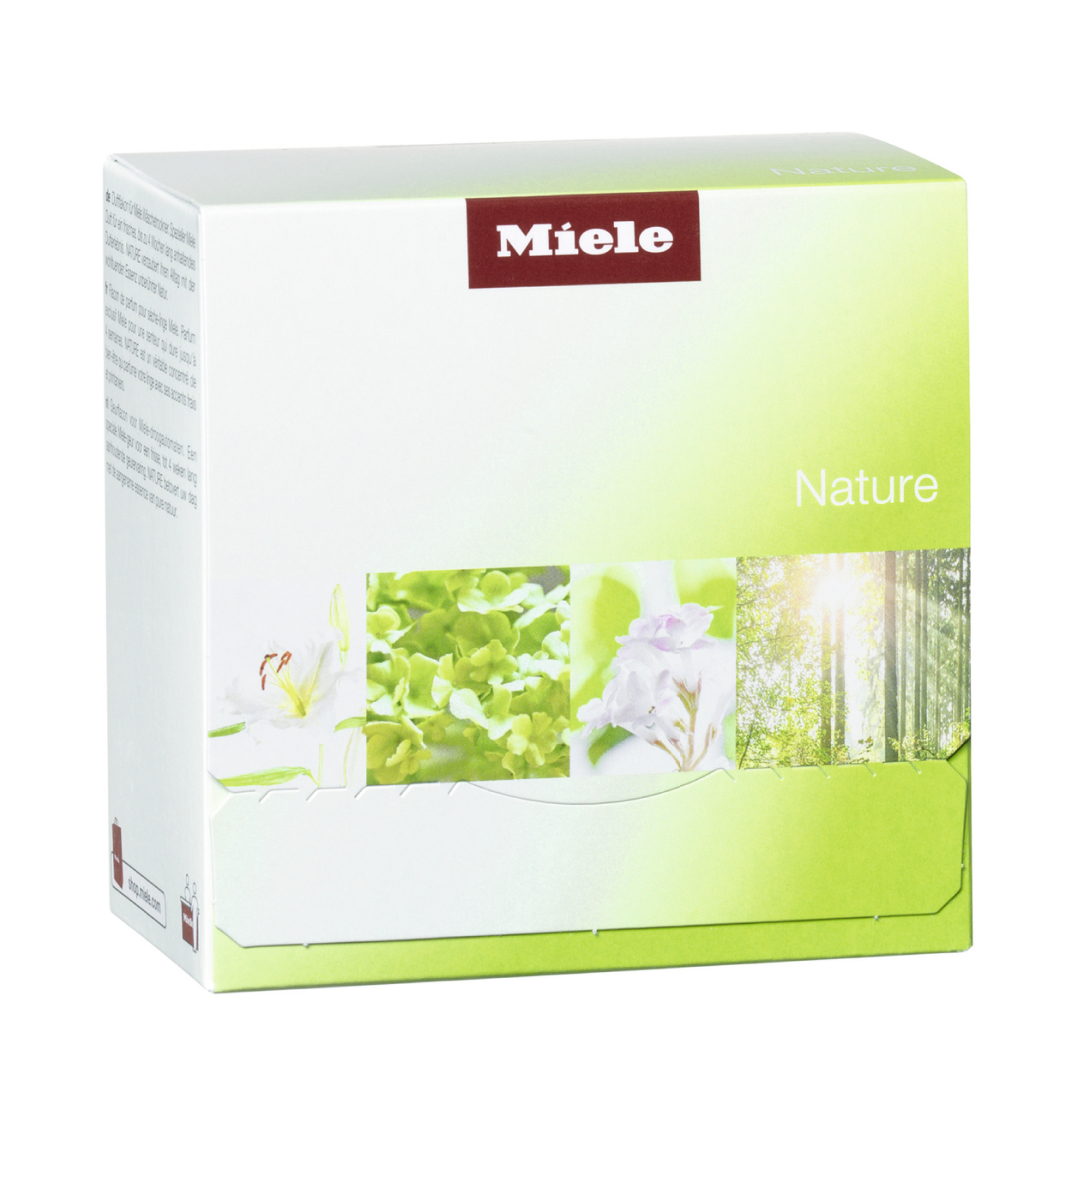 miele fa n 151 l flacon de parfum nature 12 5 ml. Black Bedroom Furniture Sets. Home Design Ideas